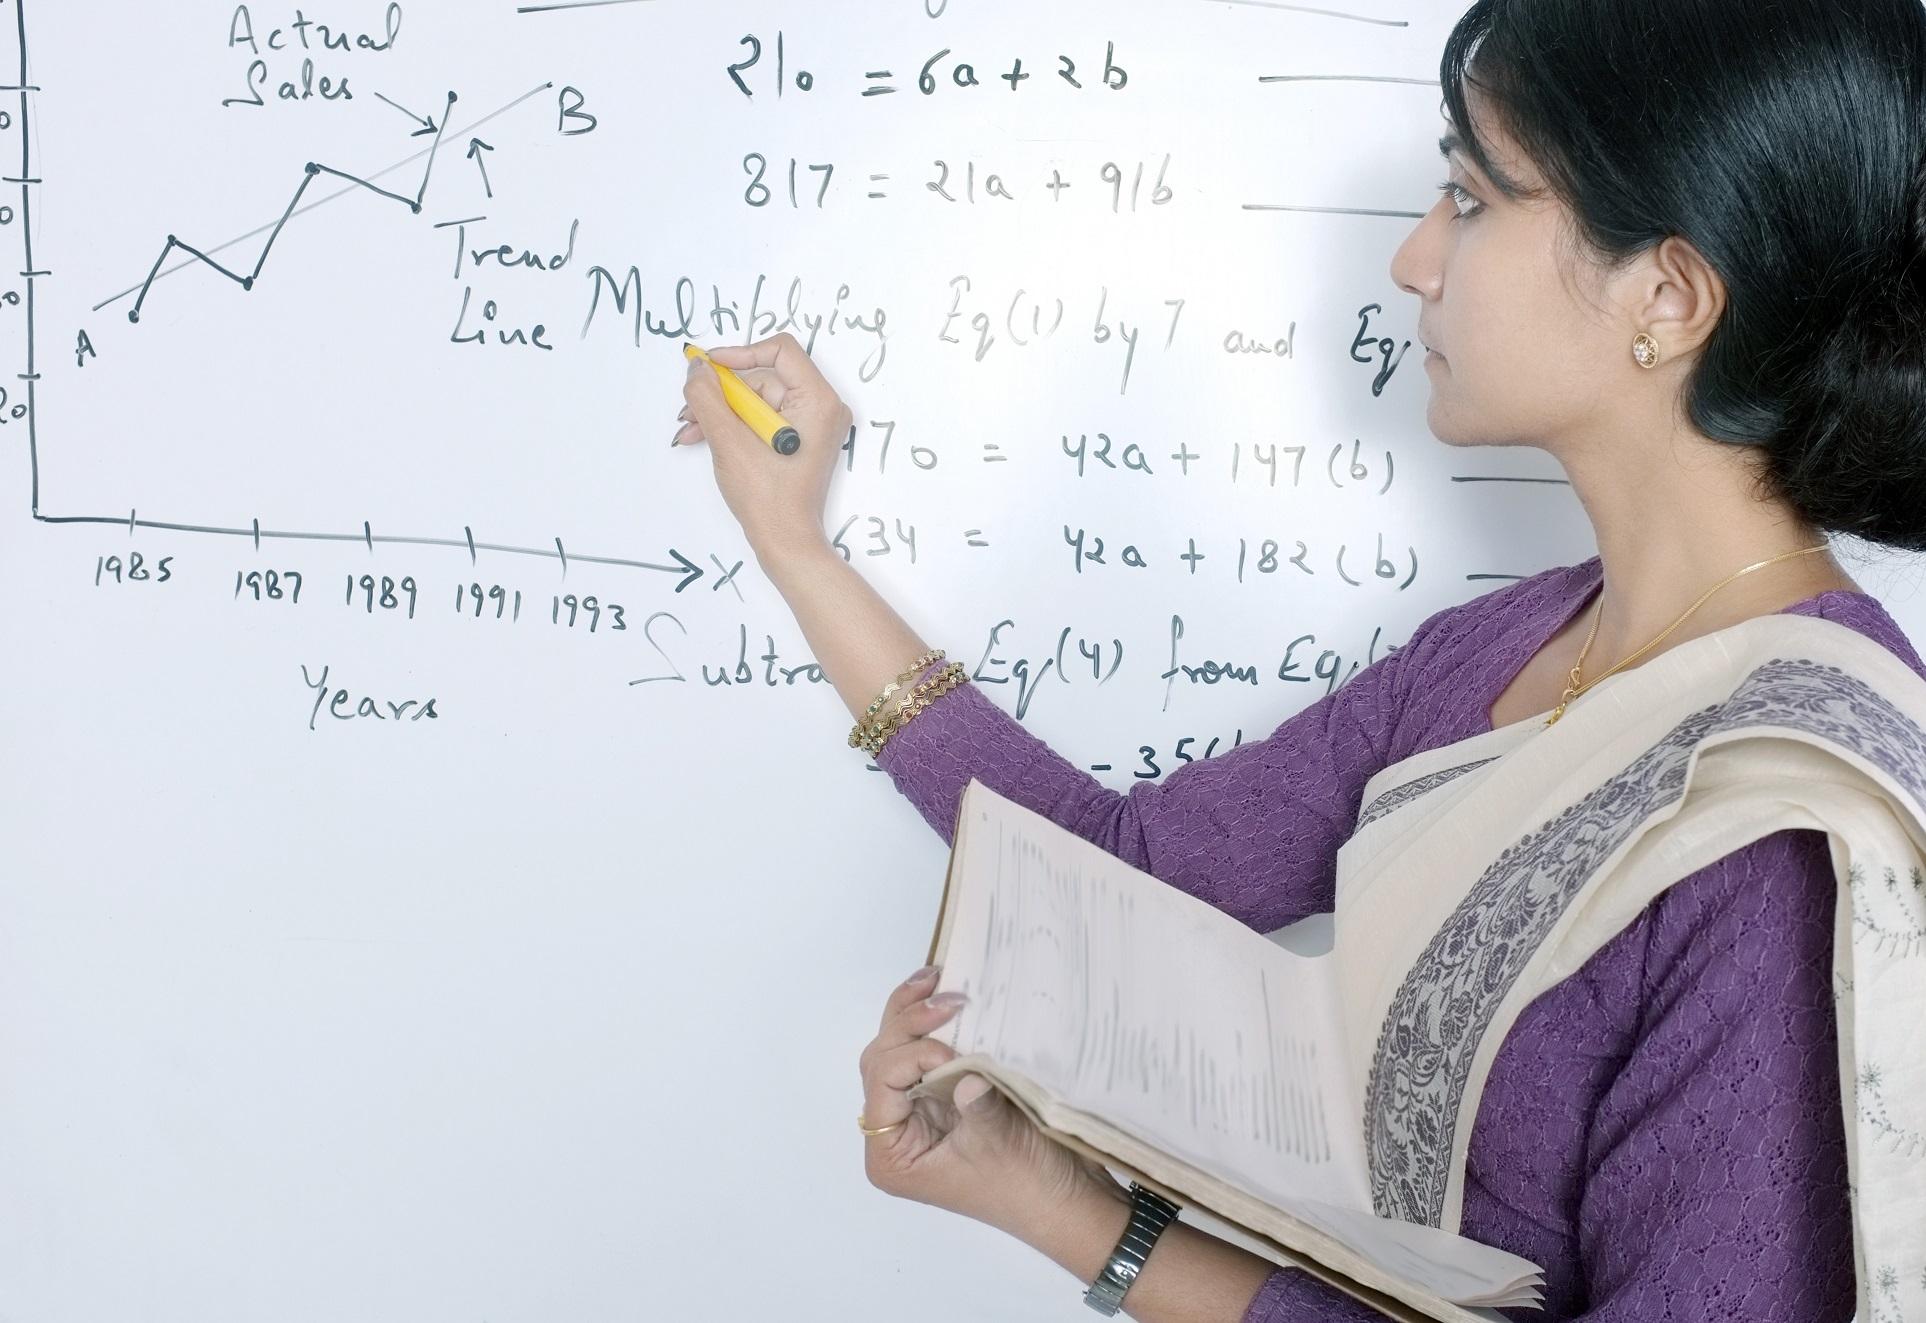 Indian professor doing an equation